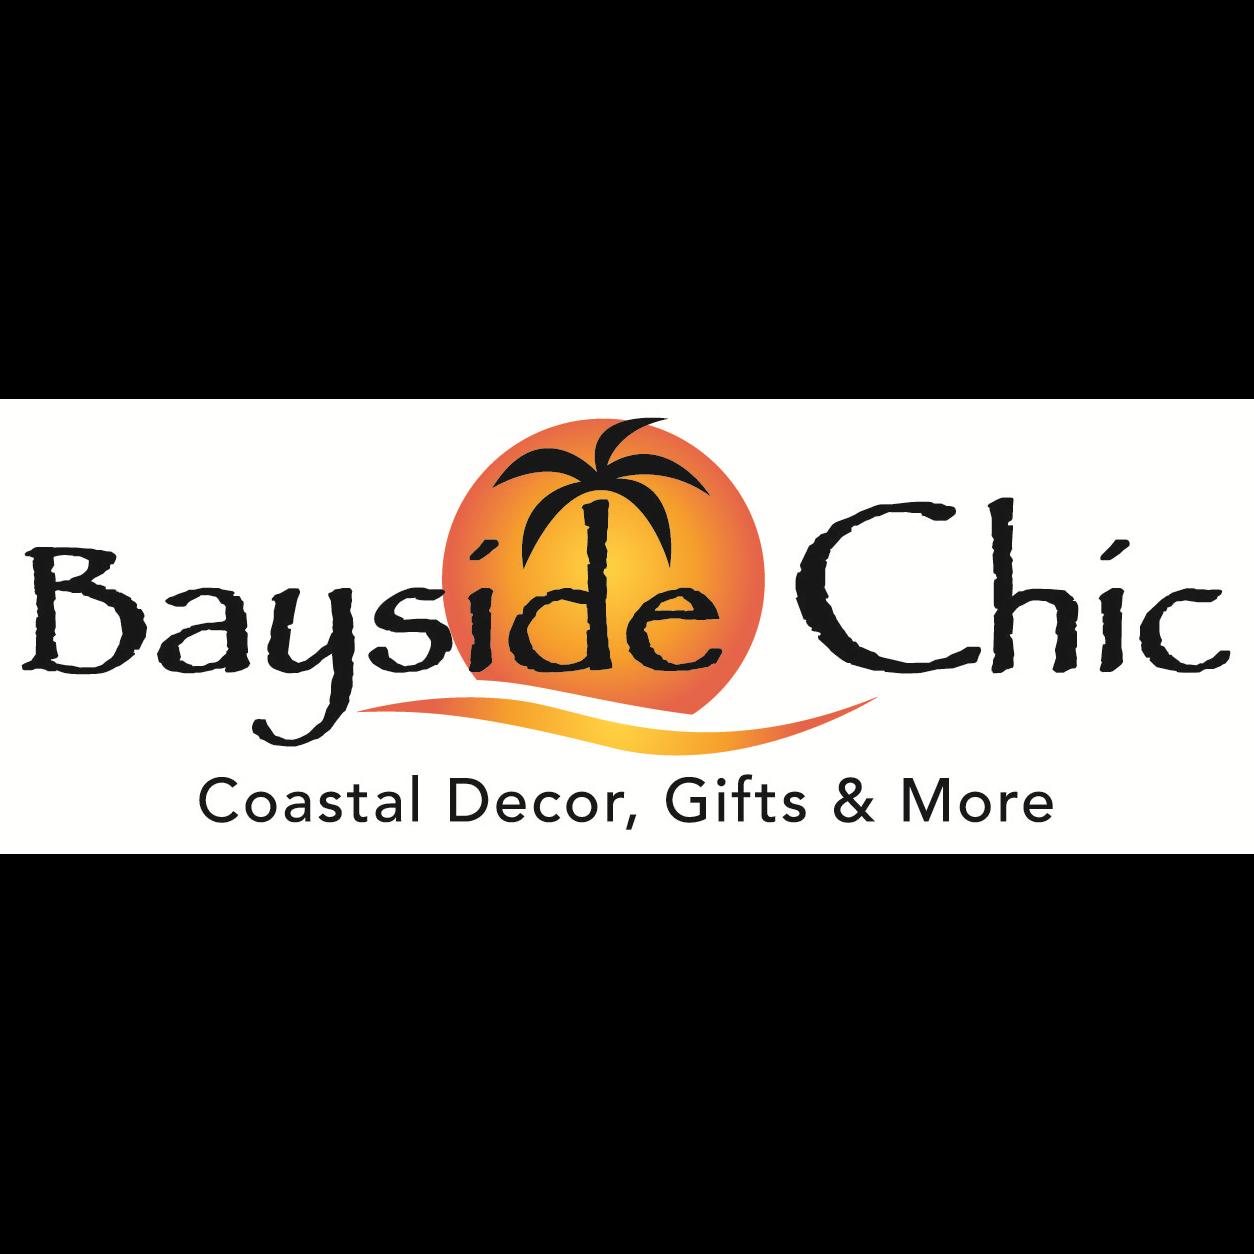 Bayside Chic Galveston